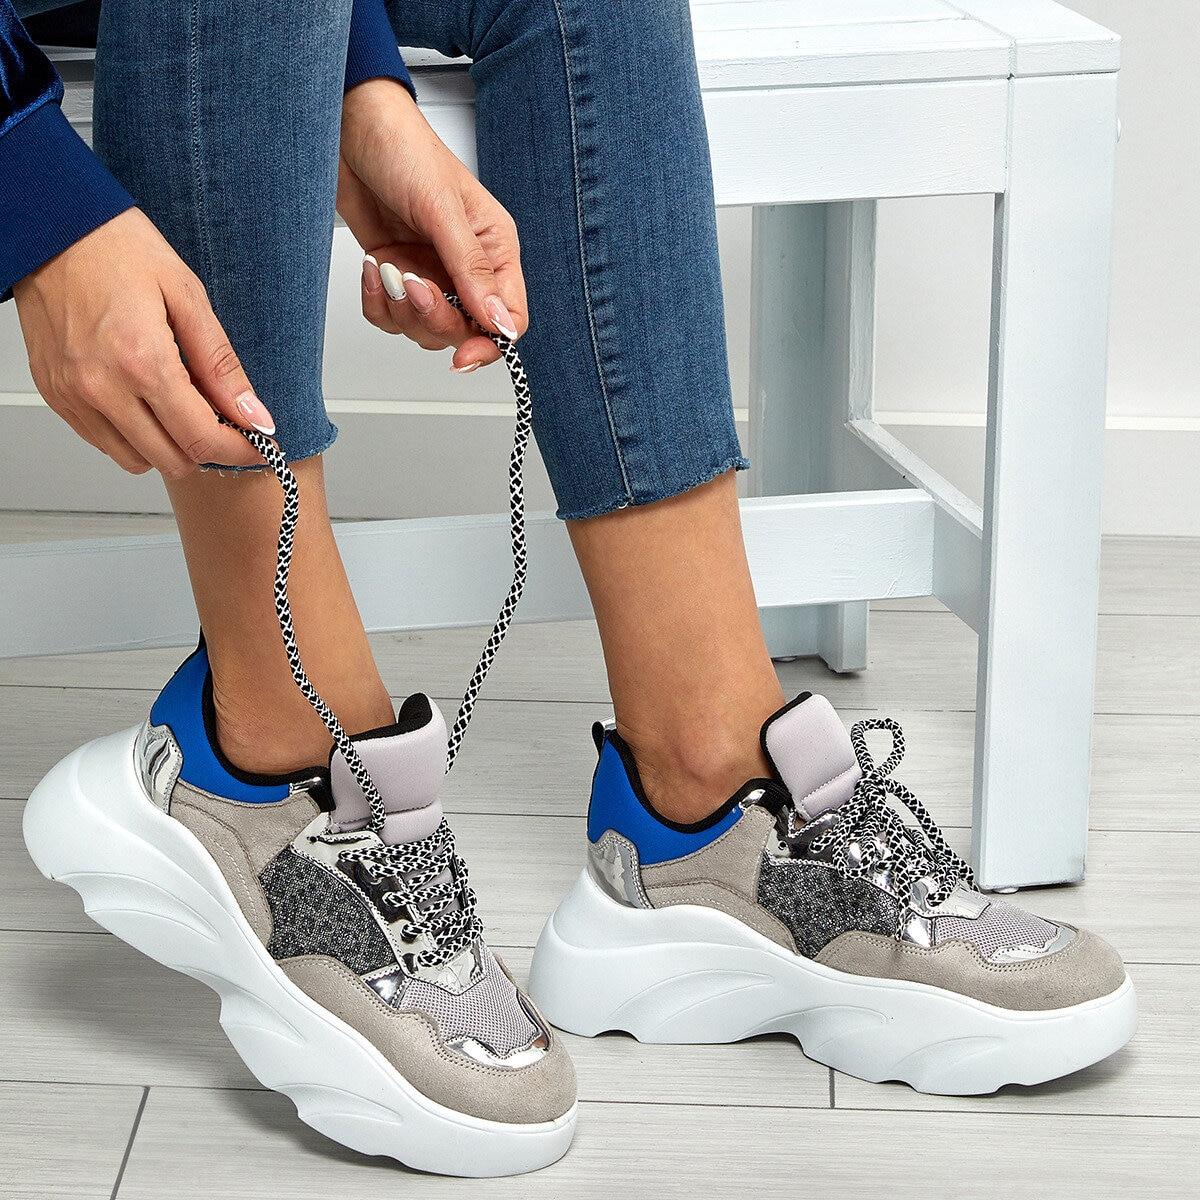 FLO Women Sneaker Shoes New Platform Ladies Sneakers Breathable Women Casual Shoes Woman Fashion Height Increasing Shoes BUTIGO 19SF-2054